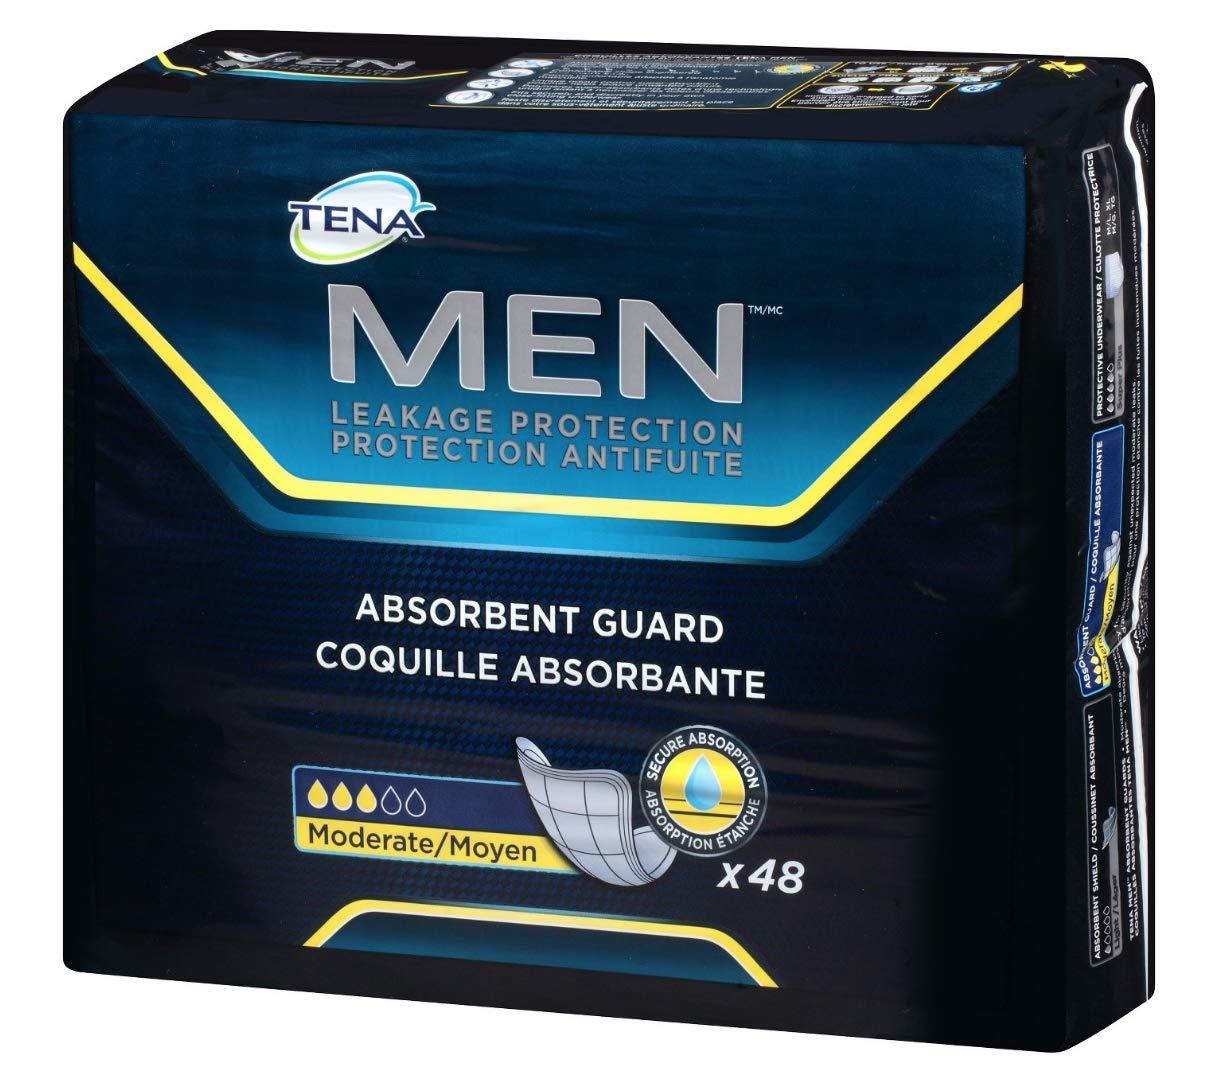 Incontinence Guards for Men - TENA Men Pads